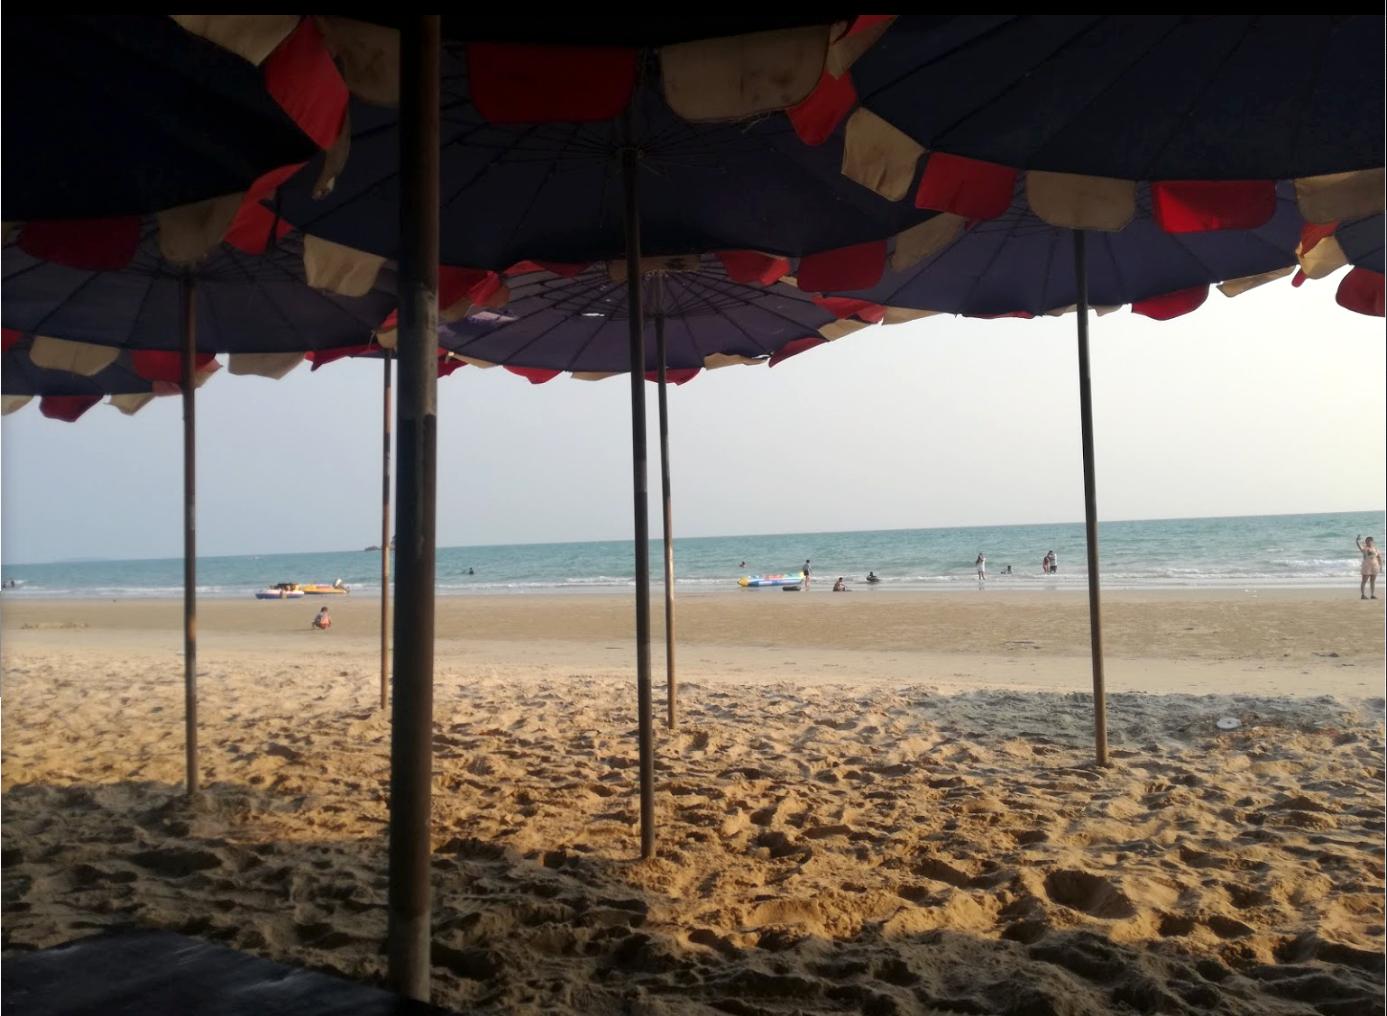 beachPhoto3.png